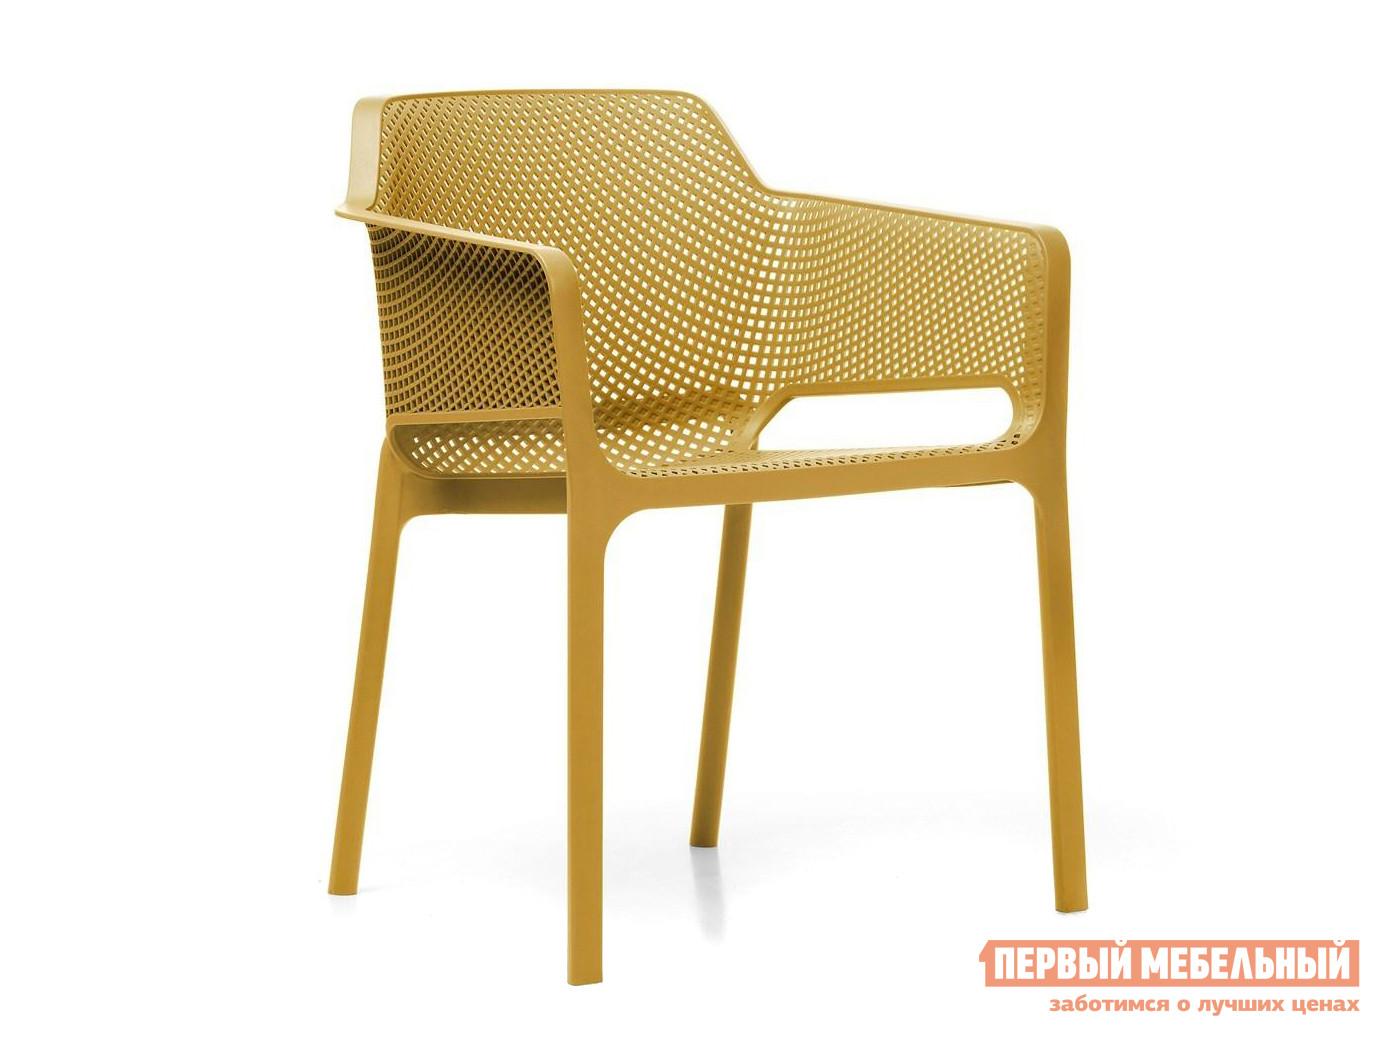 Пластиковый стул Рихаус Net 4032656000 / 4032675000 пластиковый стул рихаус riva bistrot